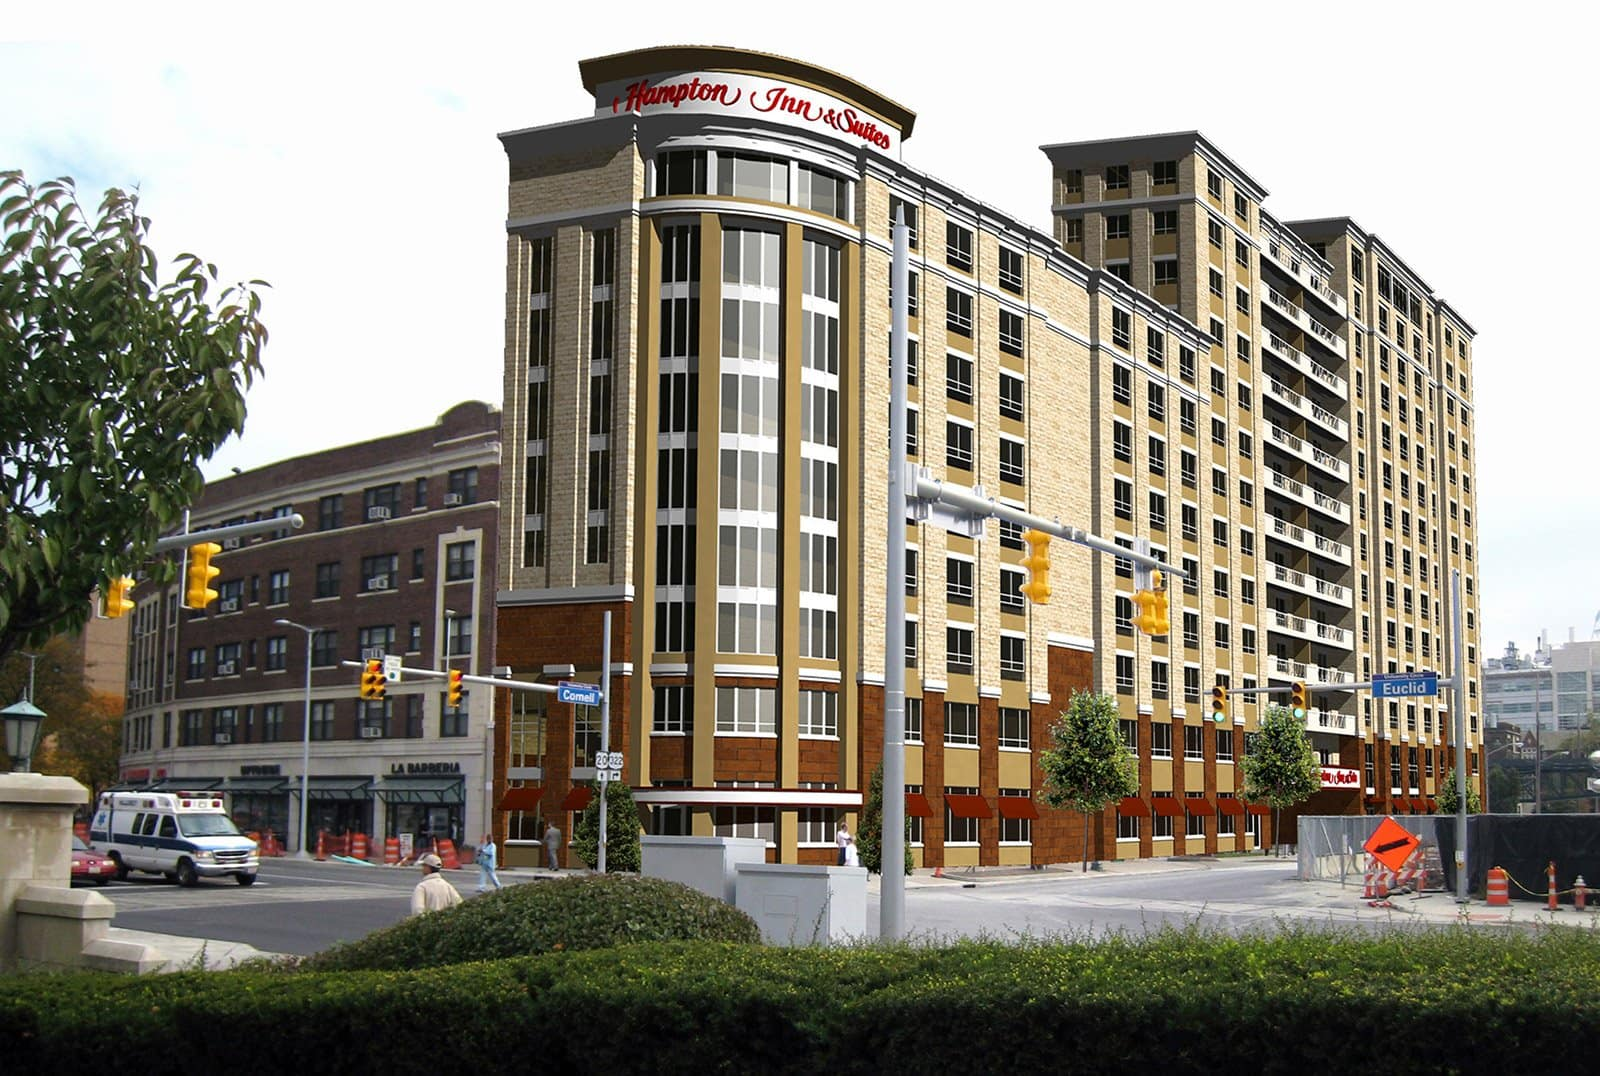 Hospitality Designers Arkinetics Hotels One University Circle Pool Panzica Construction Company